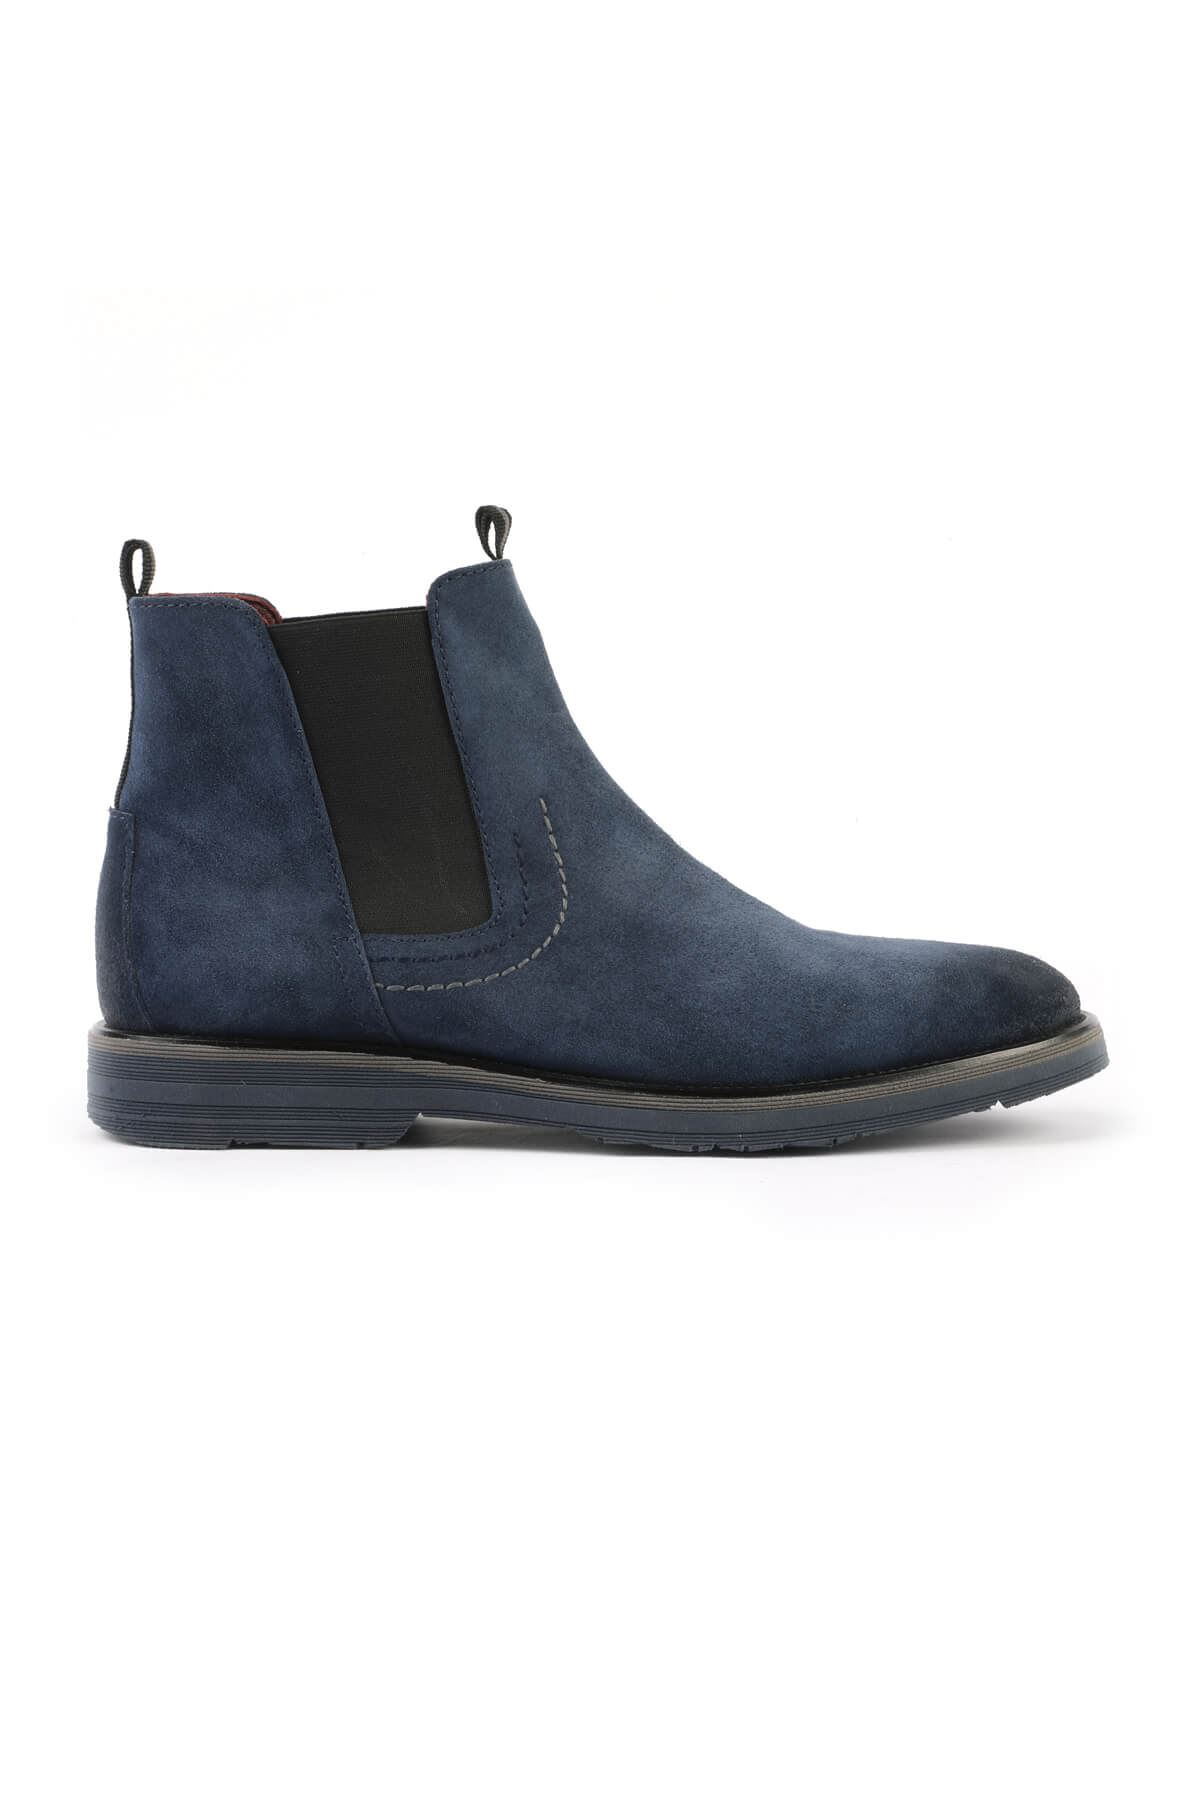 Libero 1319 Navy Blue Men's Boots